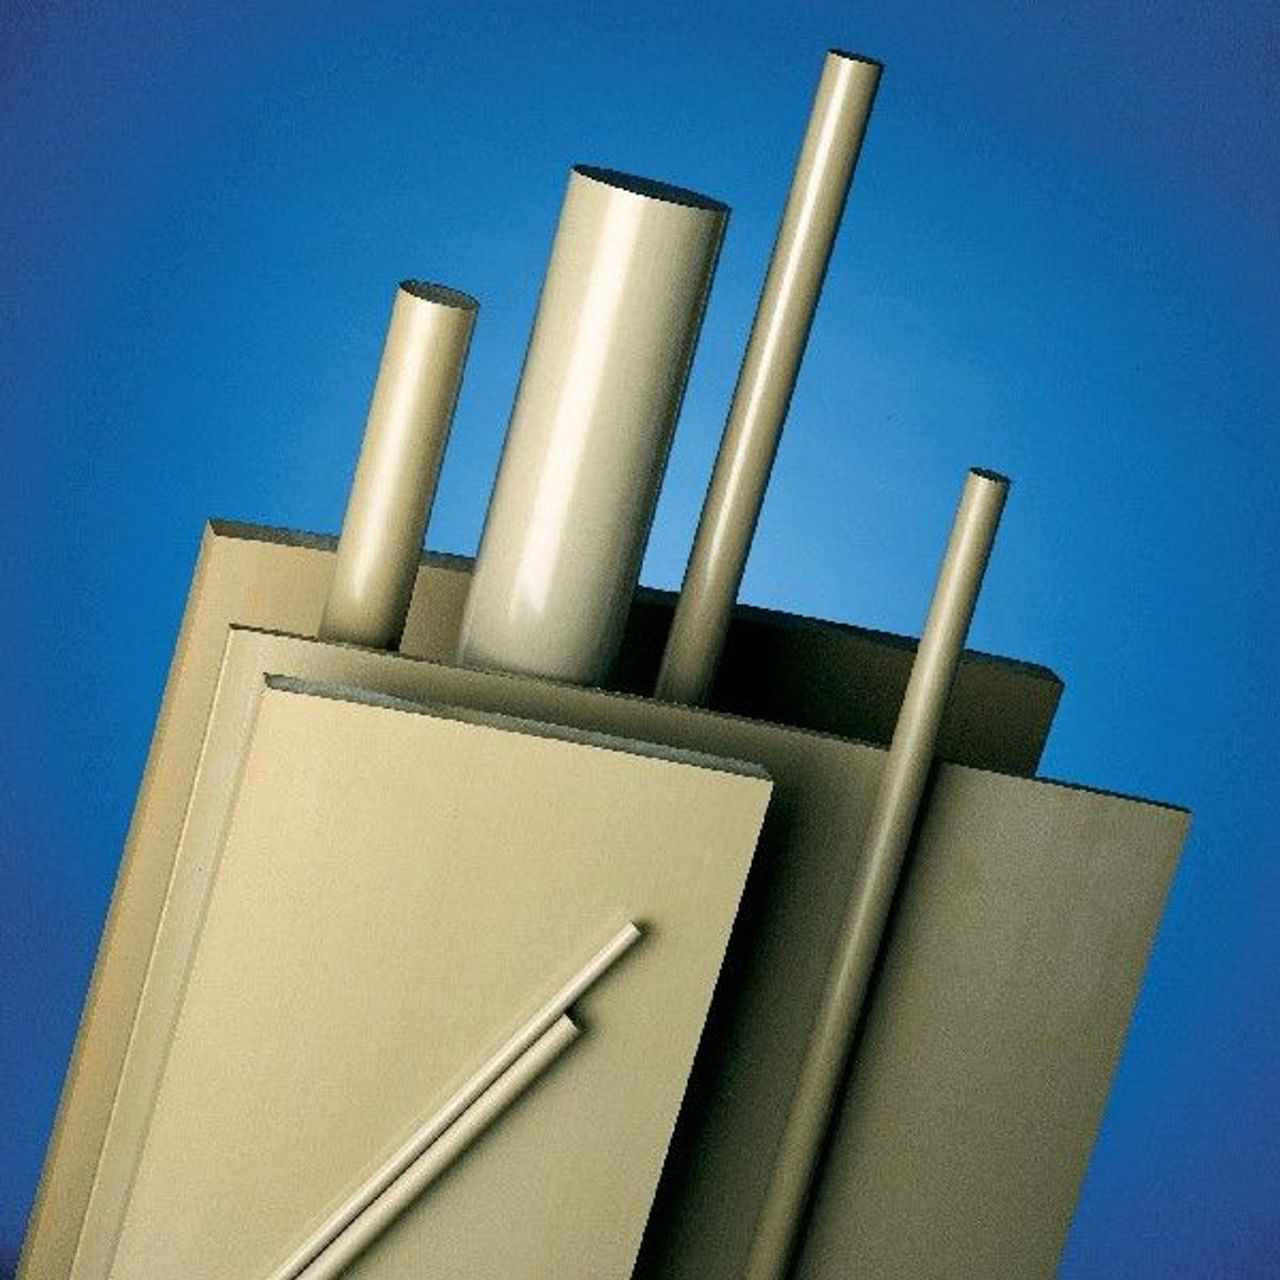 PEEK (Polyetheretherketon) plaat